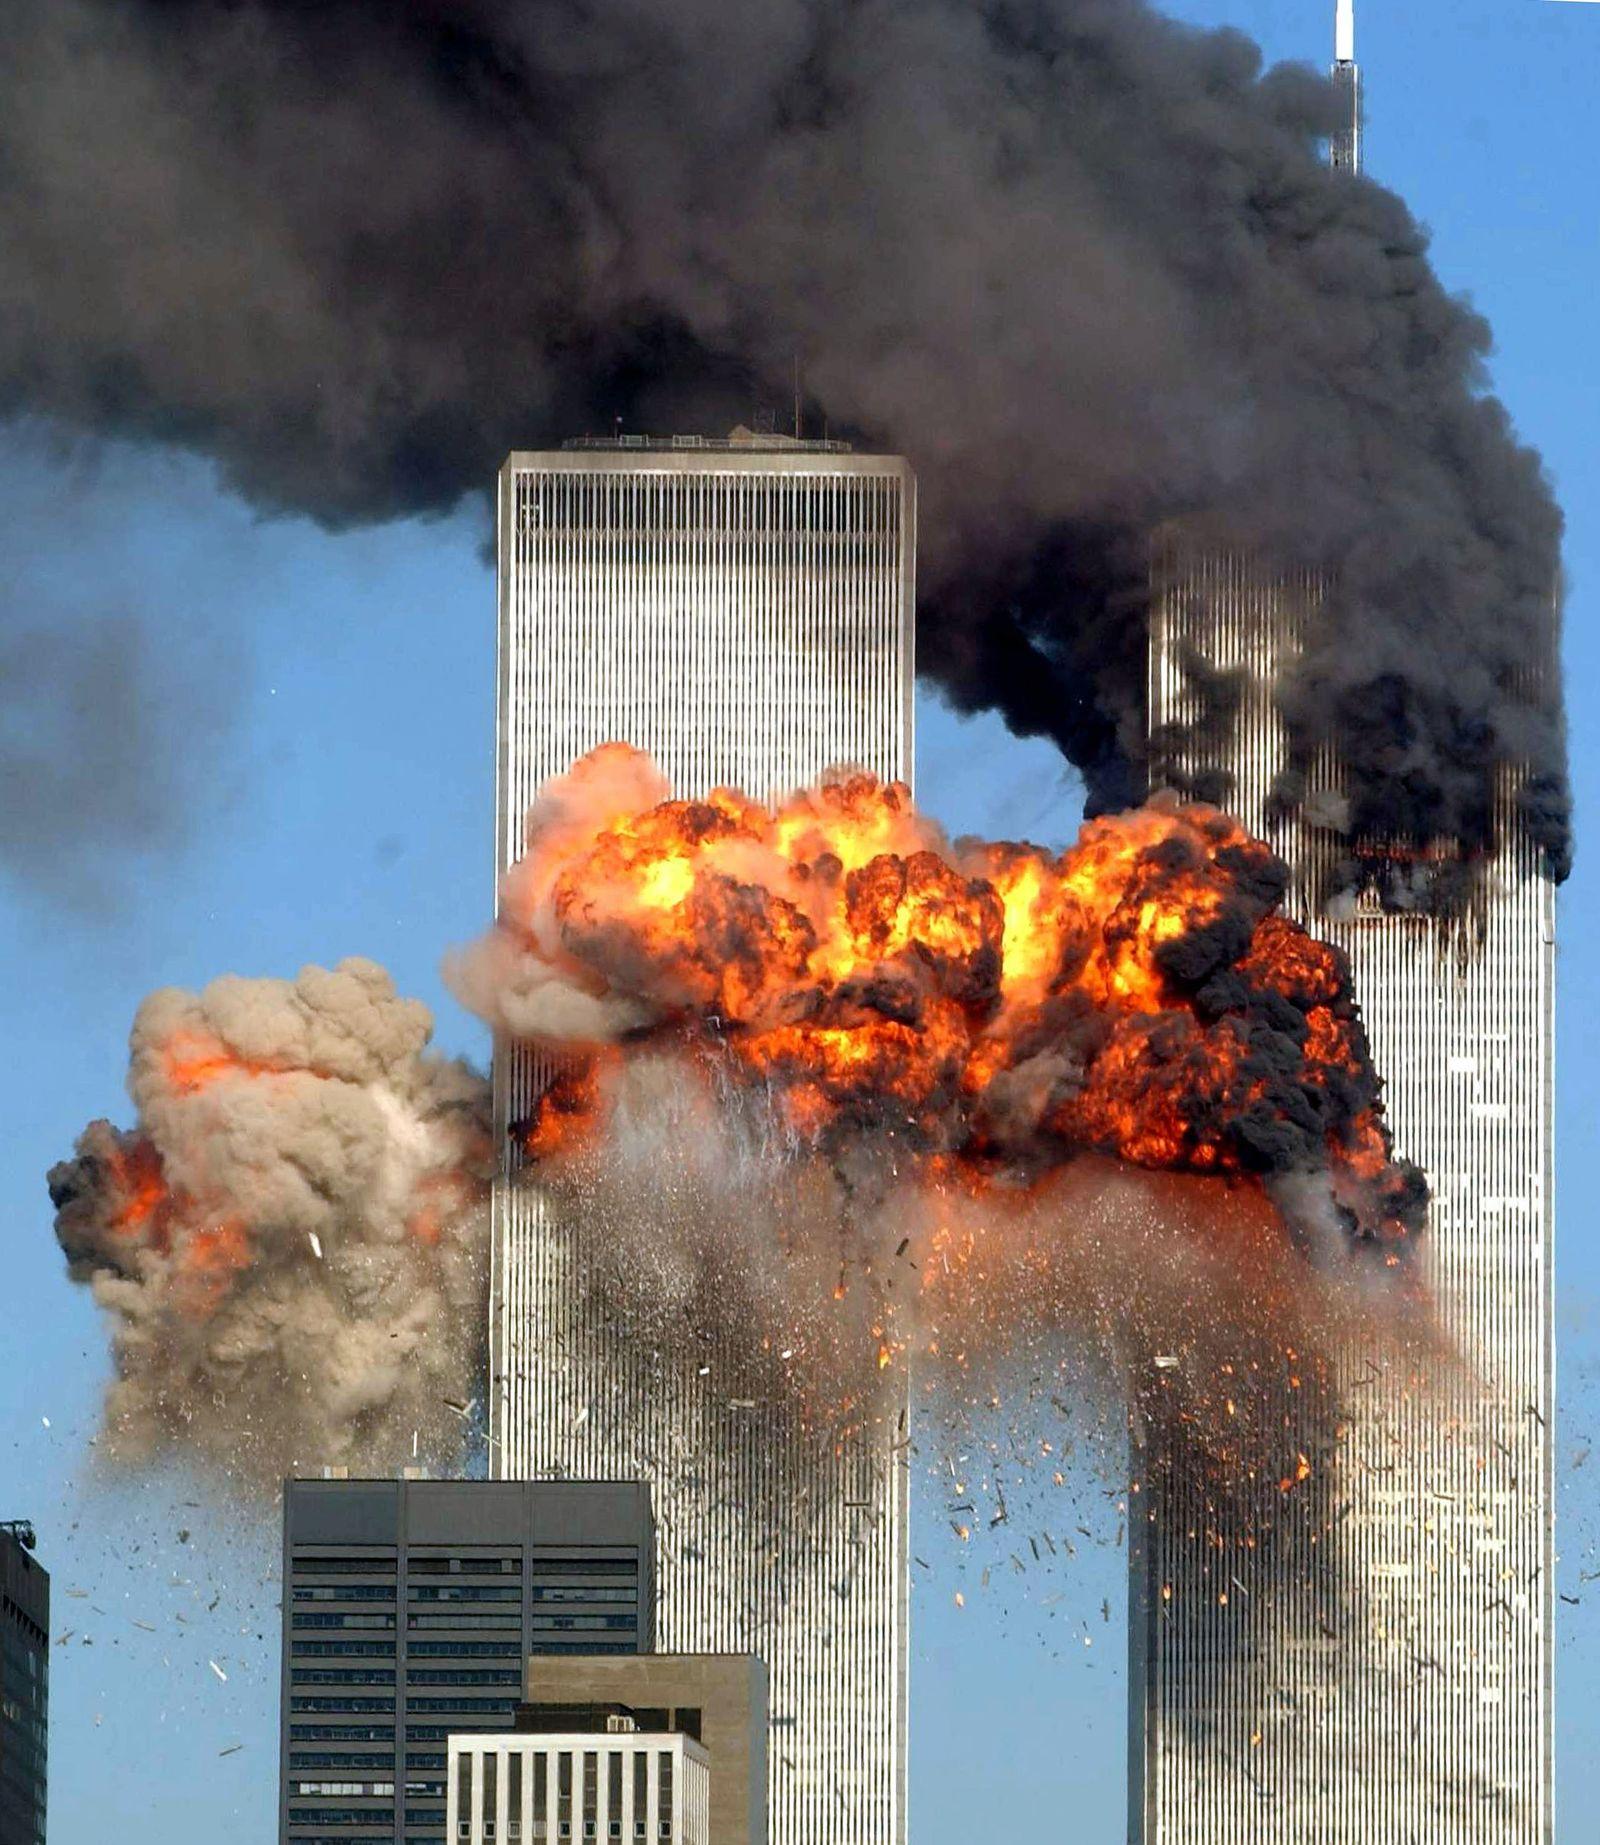 Yassin/ Jahrzehnt/ 9/11